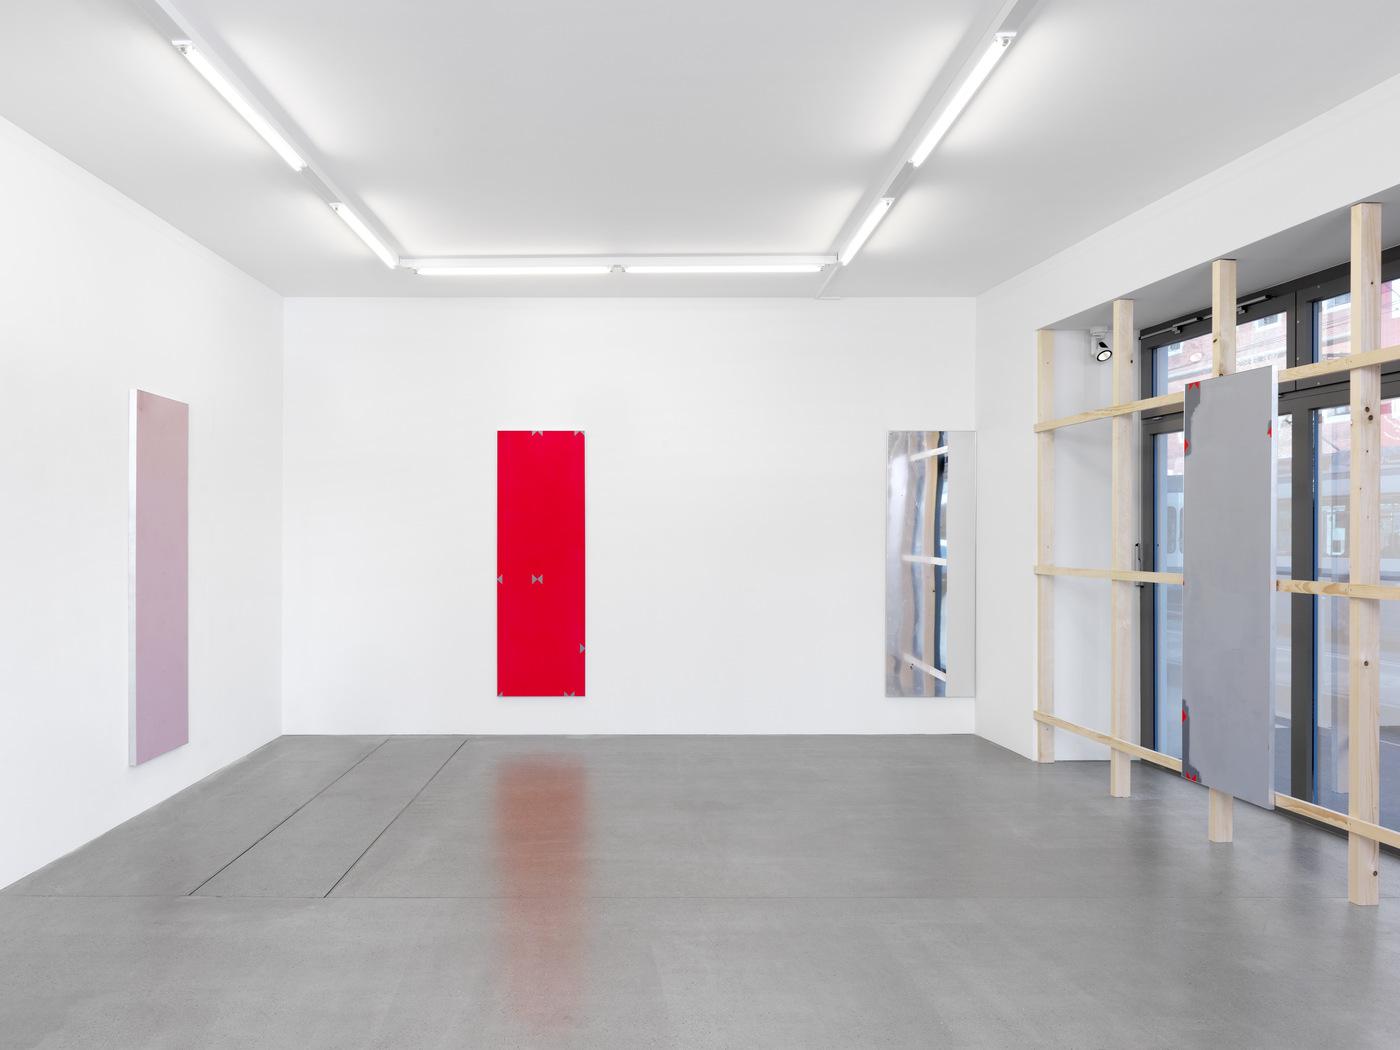 GMB_Oberthaler_InstallationImage_1